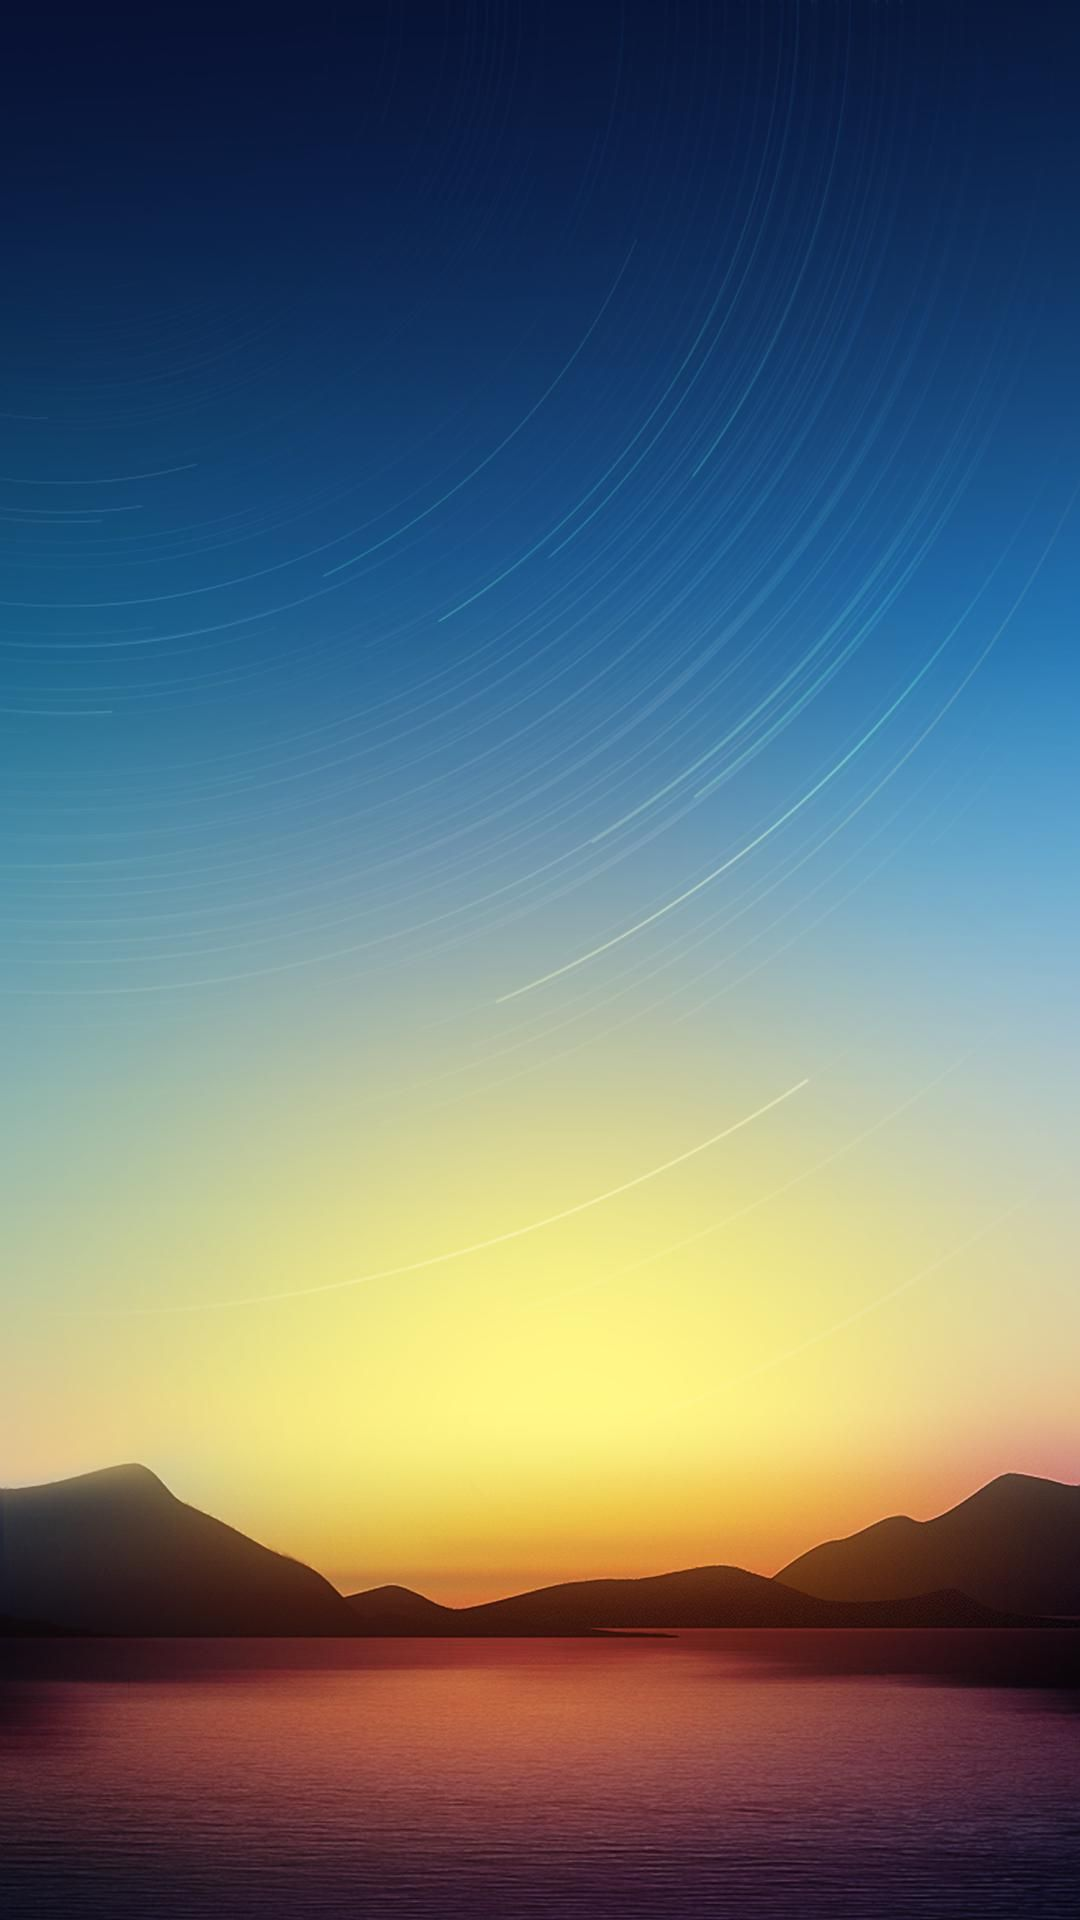 Upgrade Your Screen Size With These Large Phone Wallpapers Wallpaper Para Iphone 6 Melhores Fundos Para Iphone Papel De Parede Para Samsung Galaxy